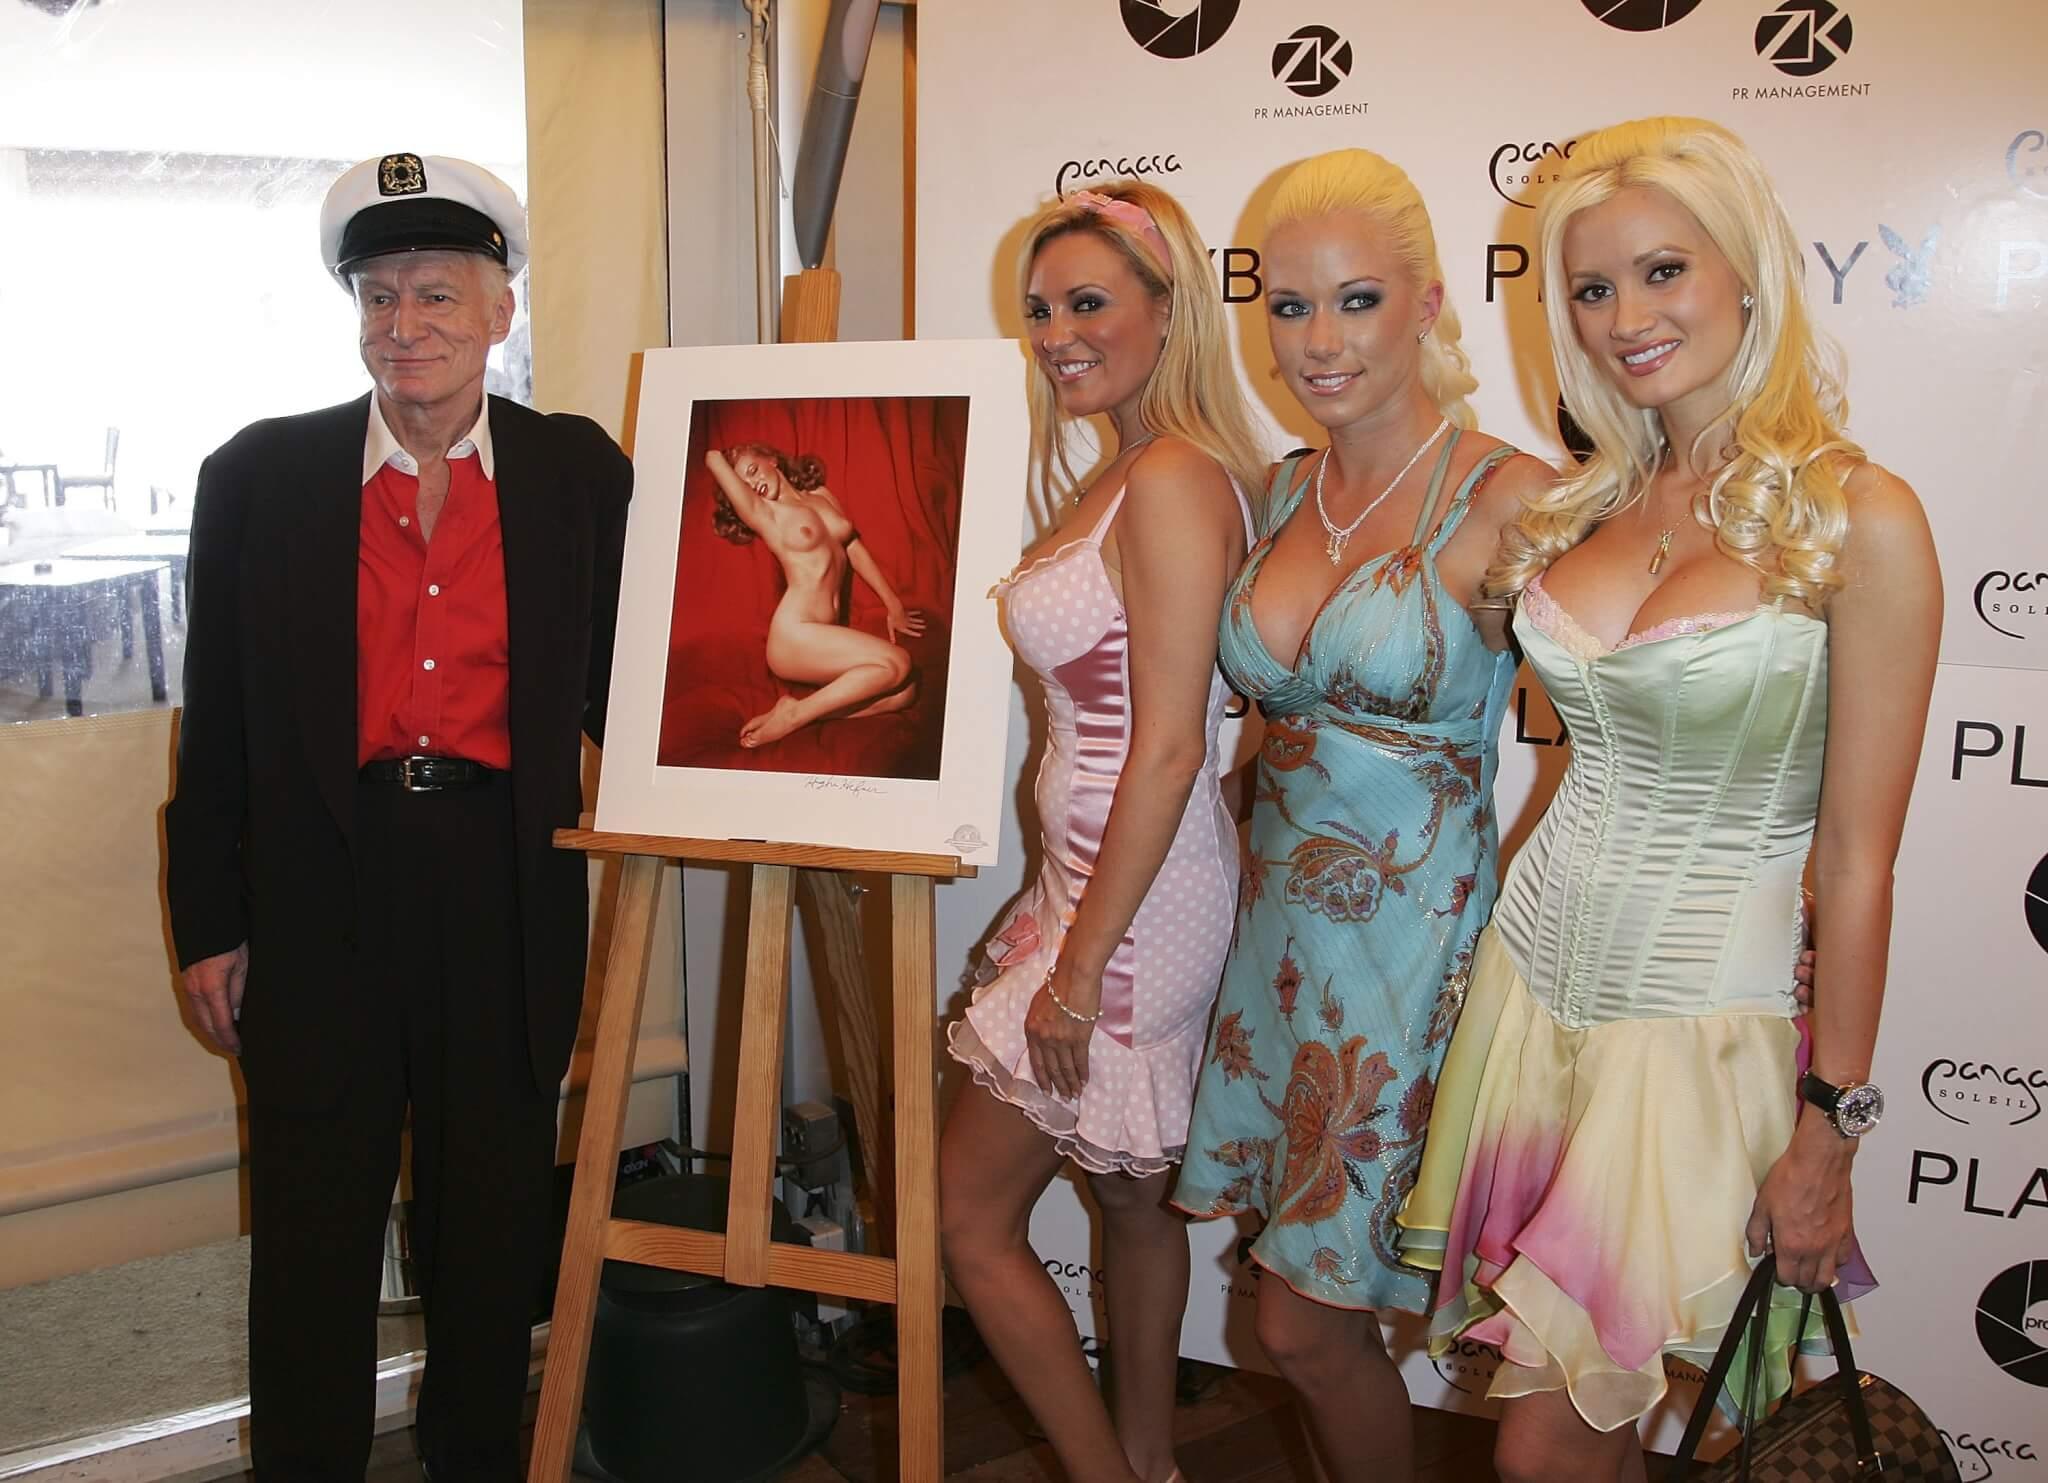 Hugh Hefner a Cannes per i suoi 80 anni.